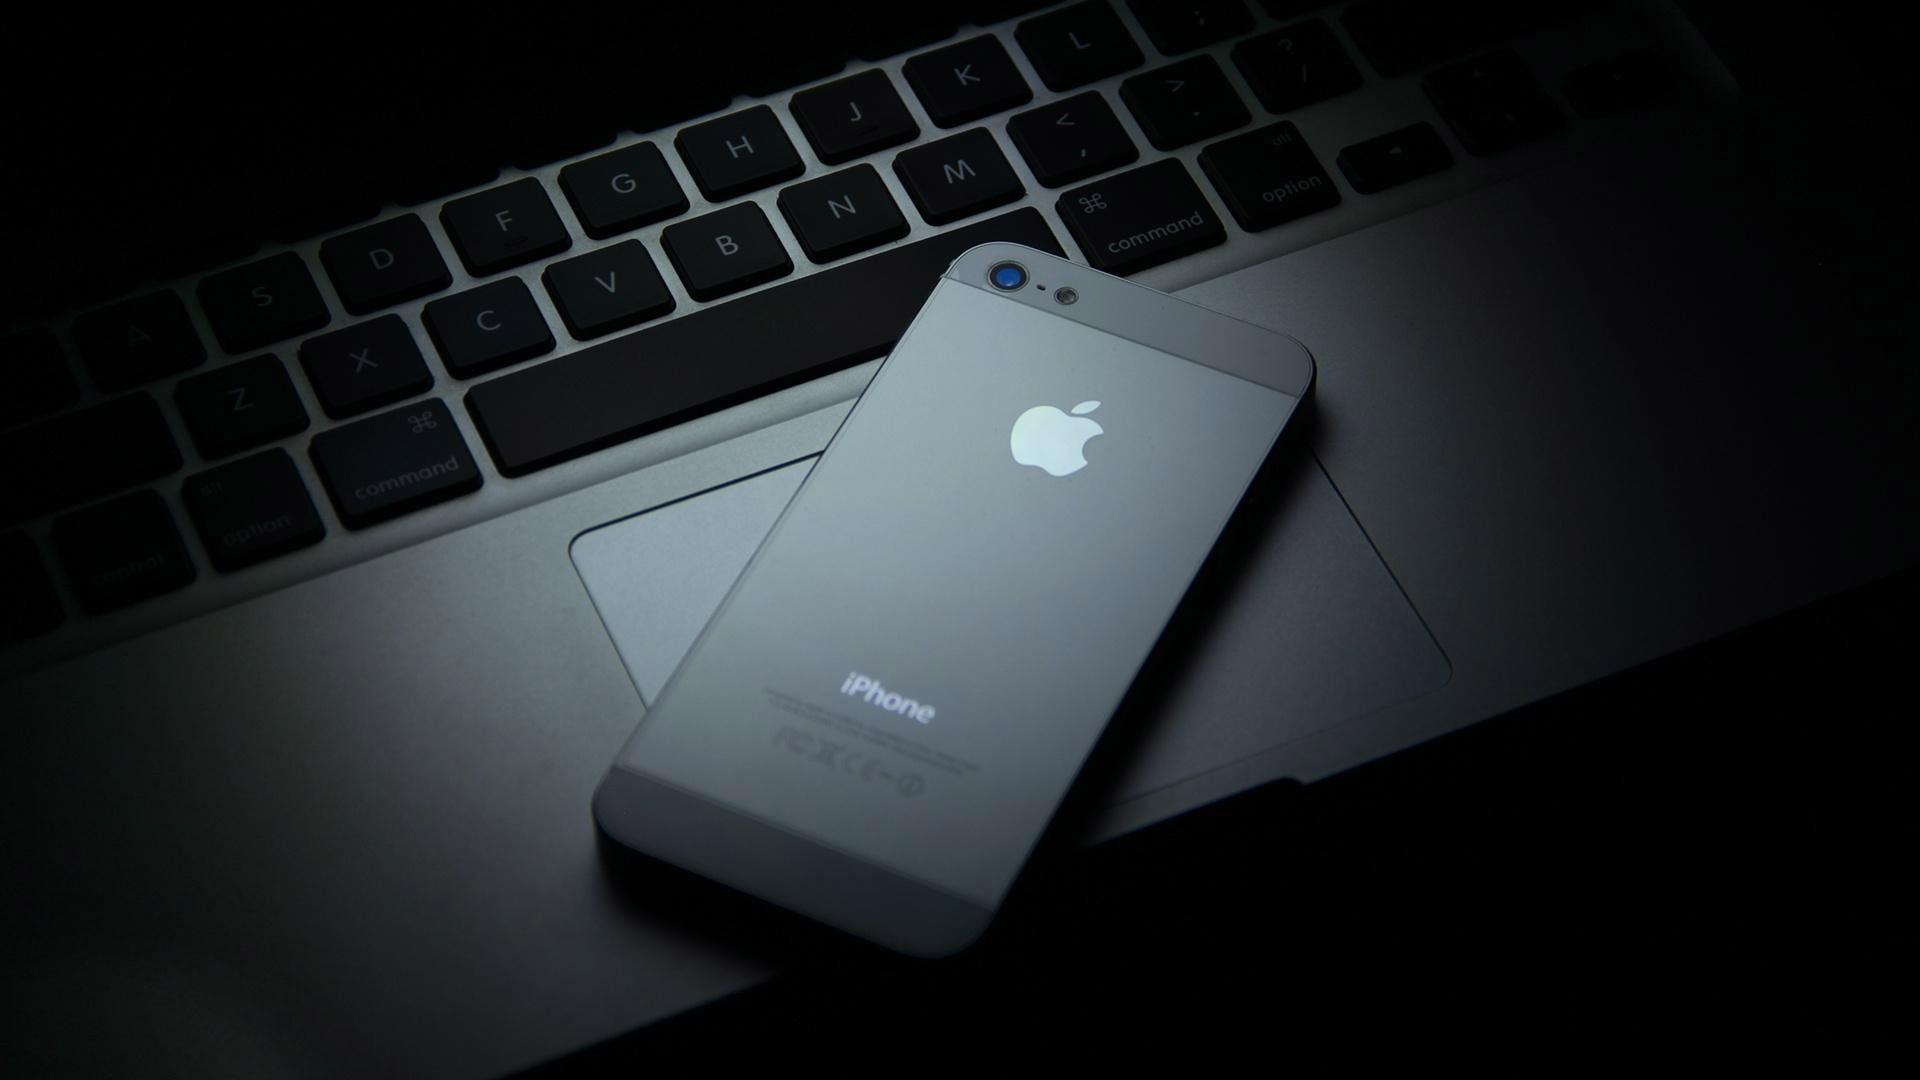 Wallpaper iphone 5s hd retina